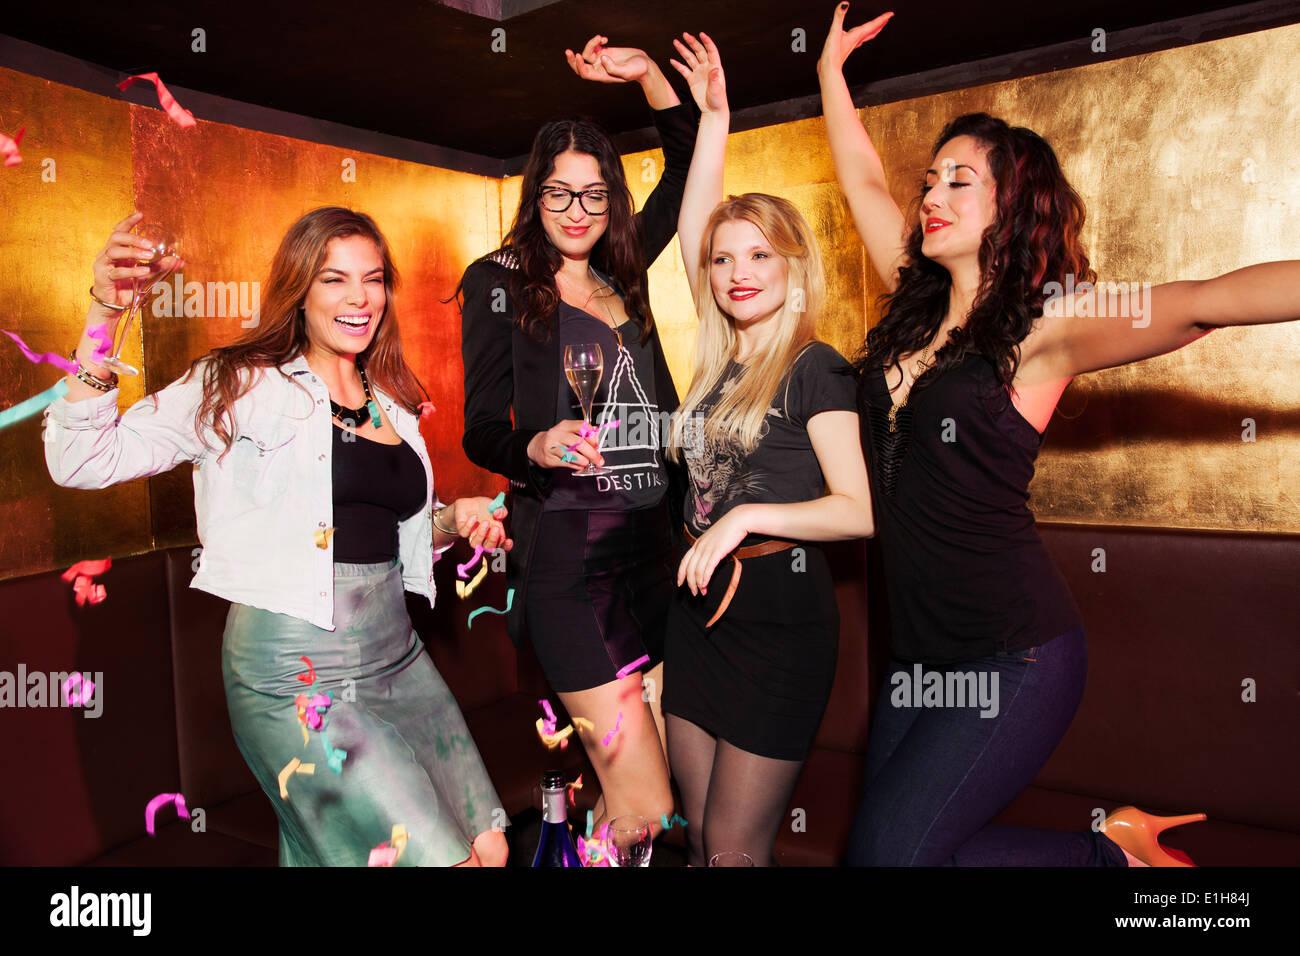 Quatre femmes friends in nightclub Photo Stock